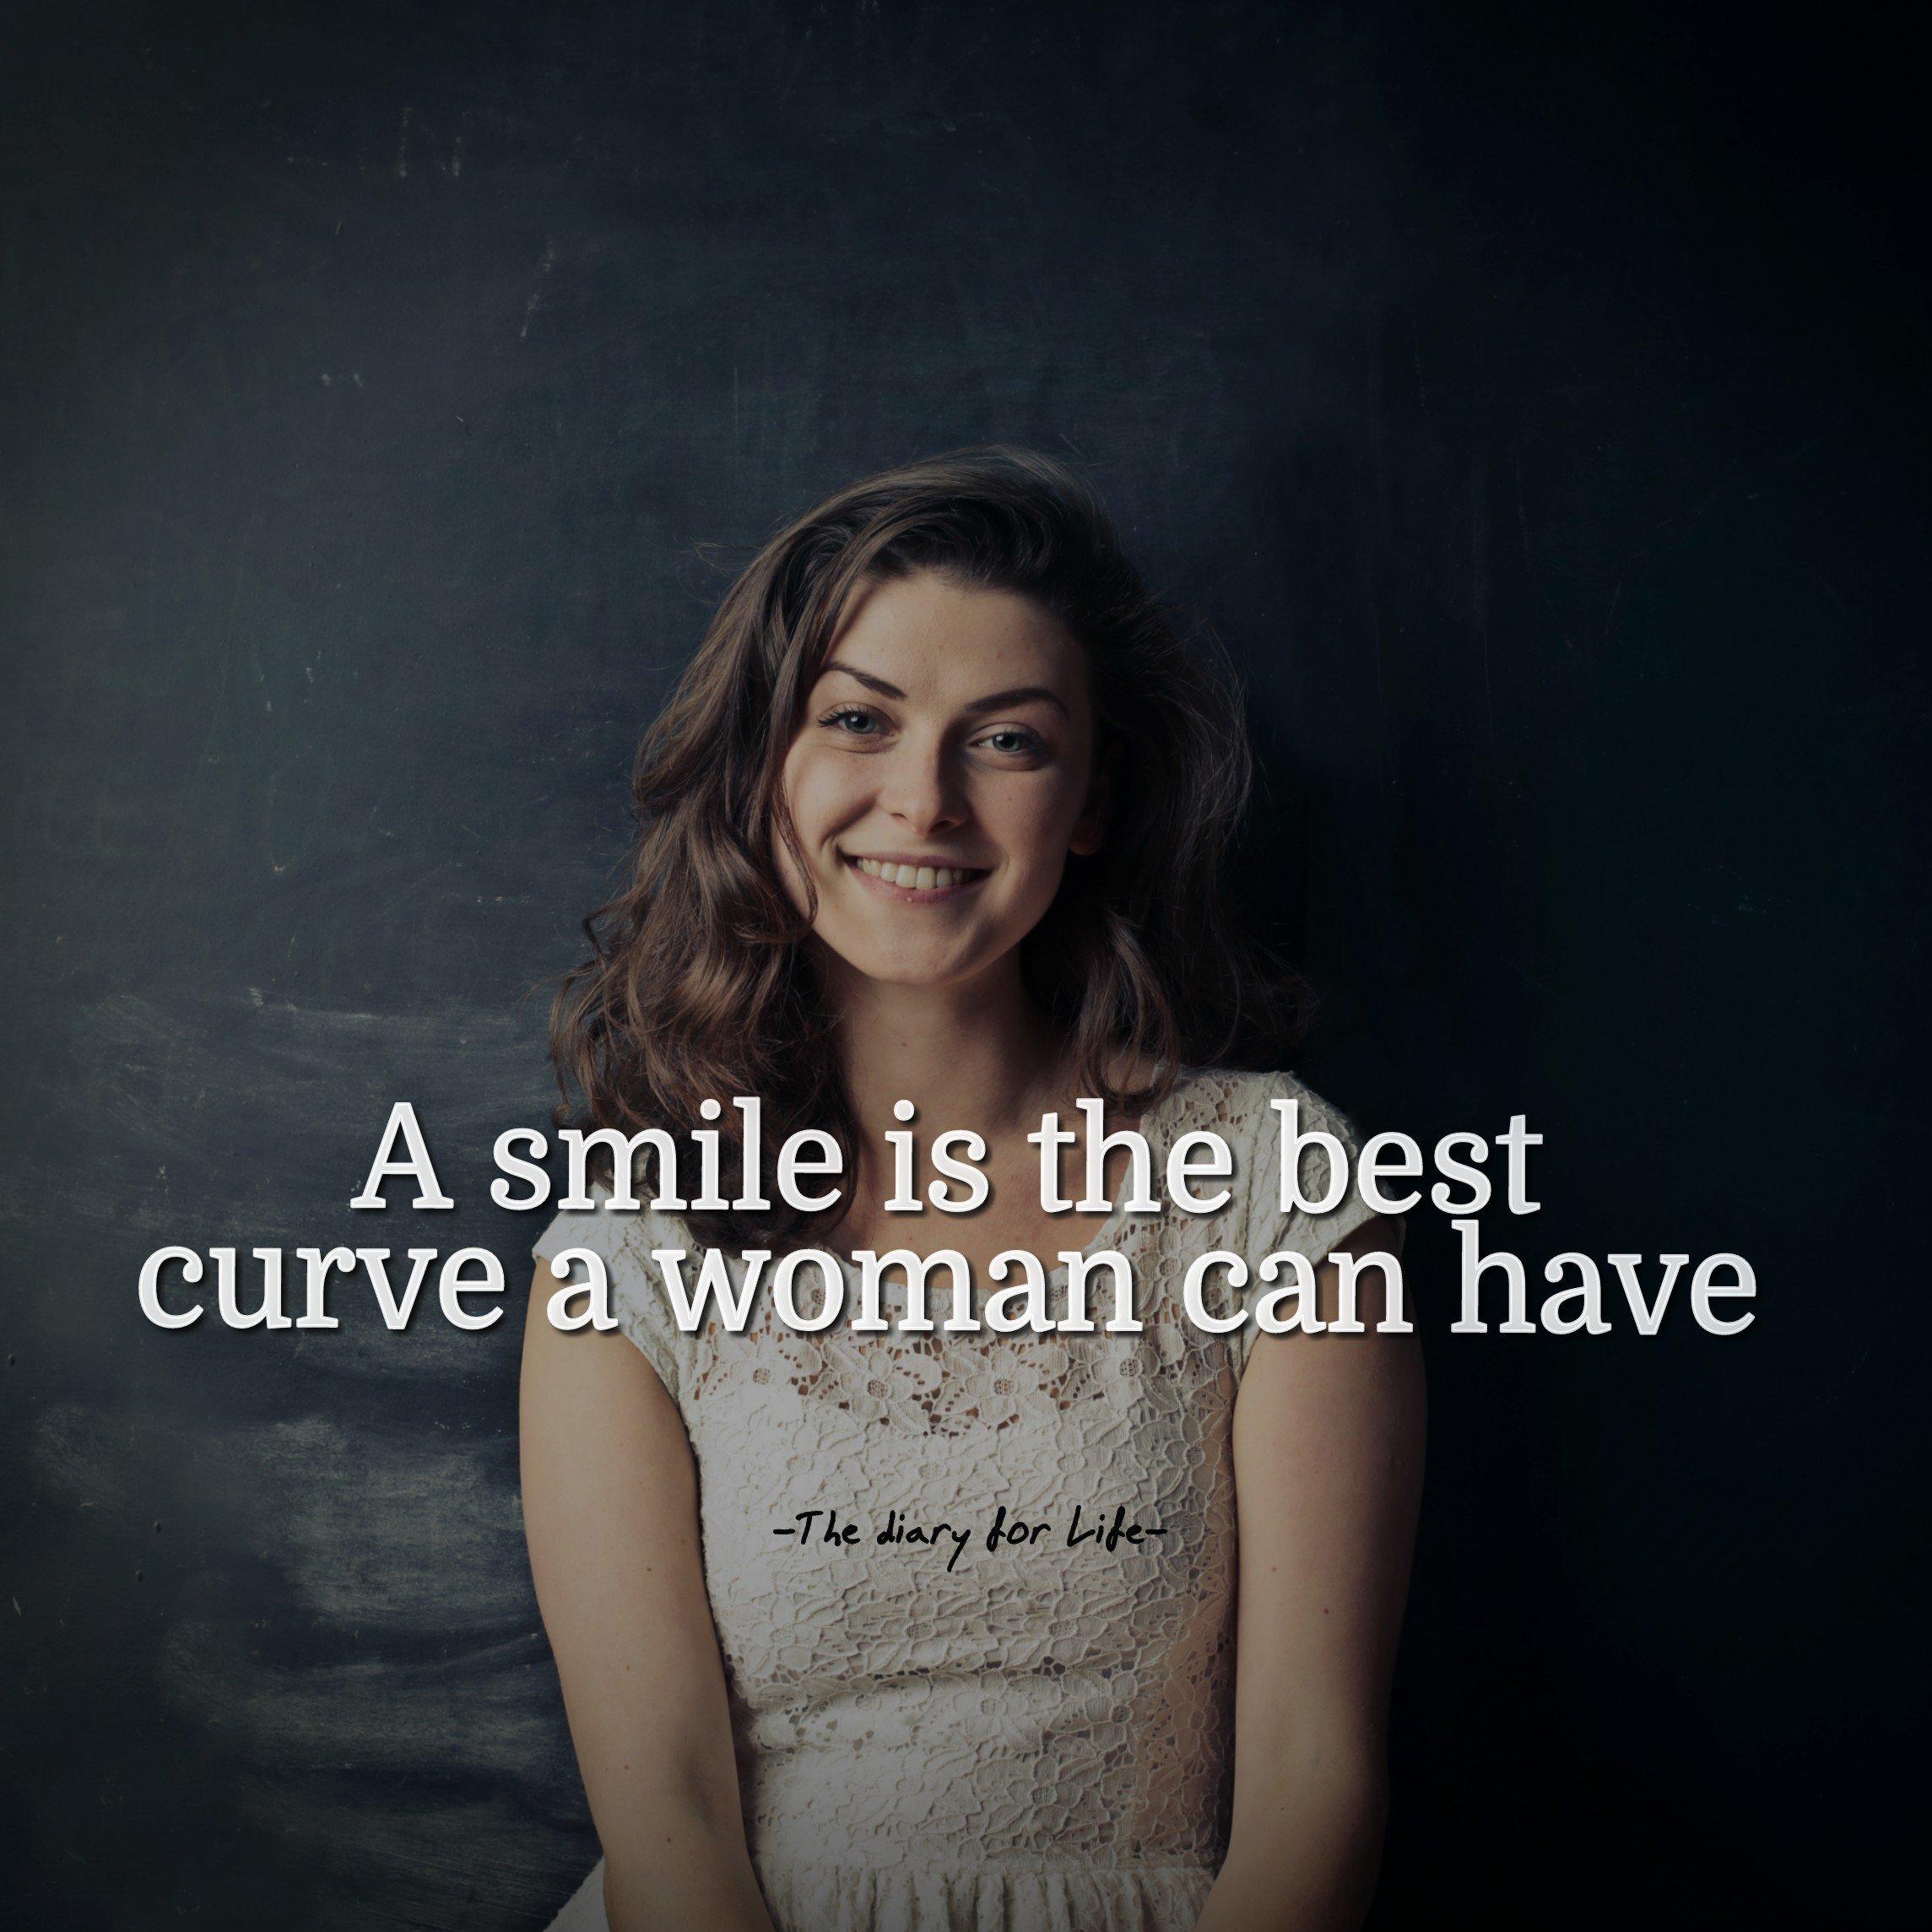 beautiful girl quotes-thediaryforlife